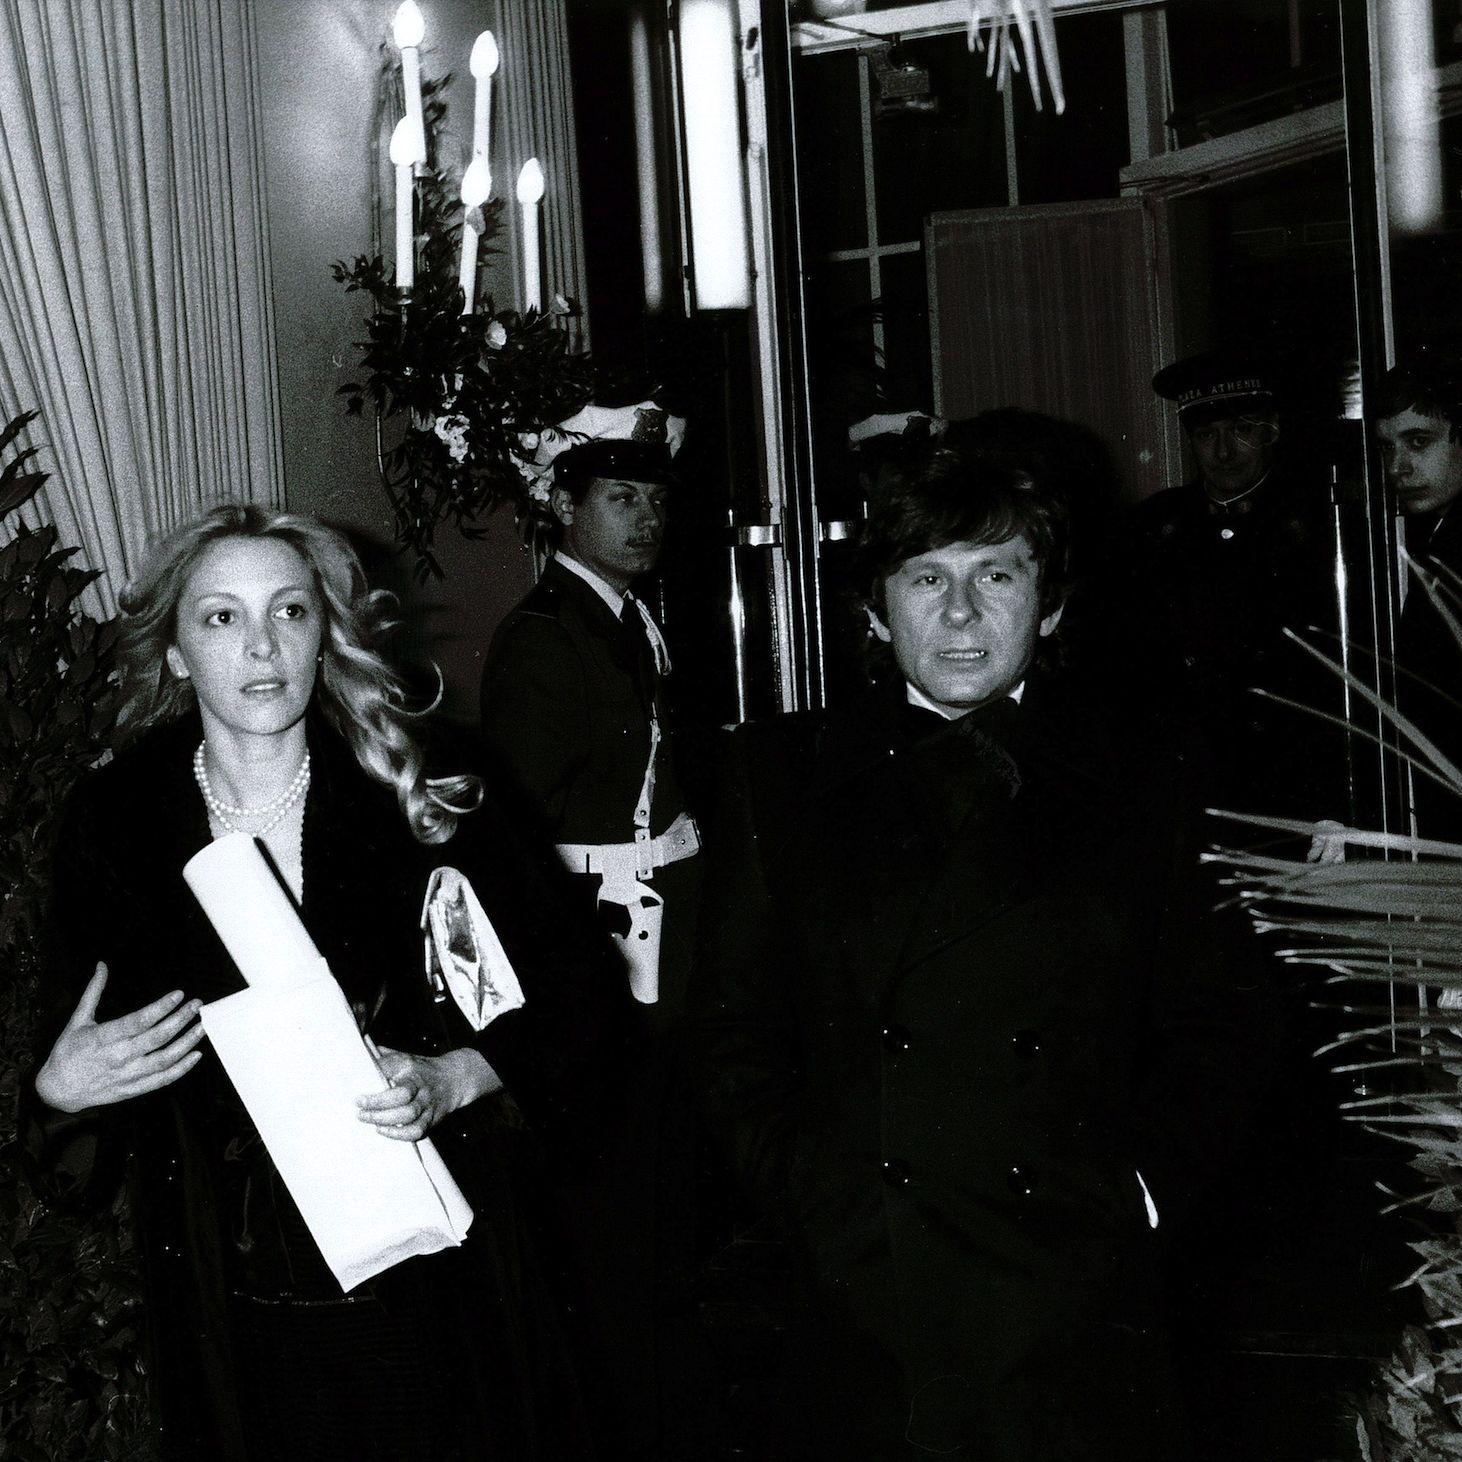 Roman Polanski and Catherine Paganesi seen exiting the hotel.